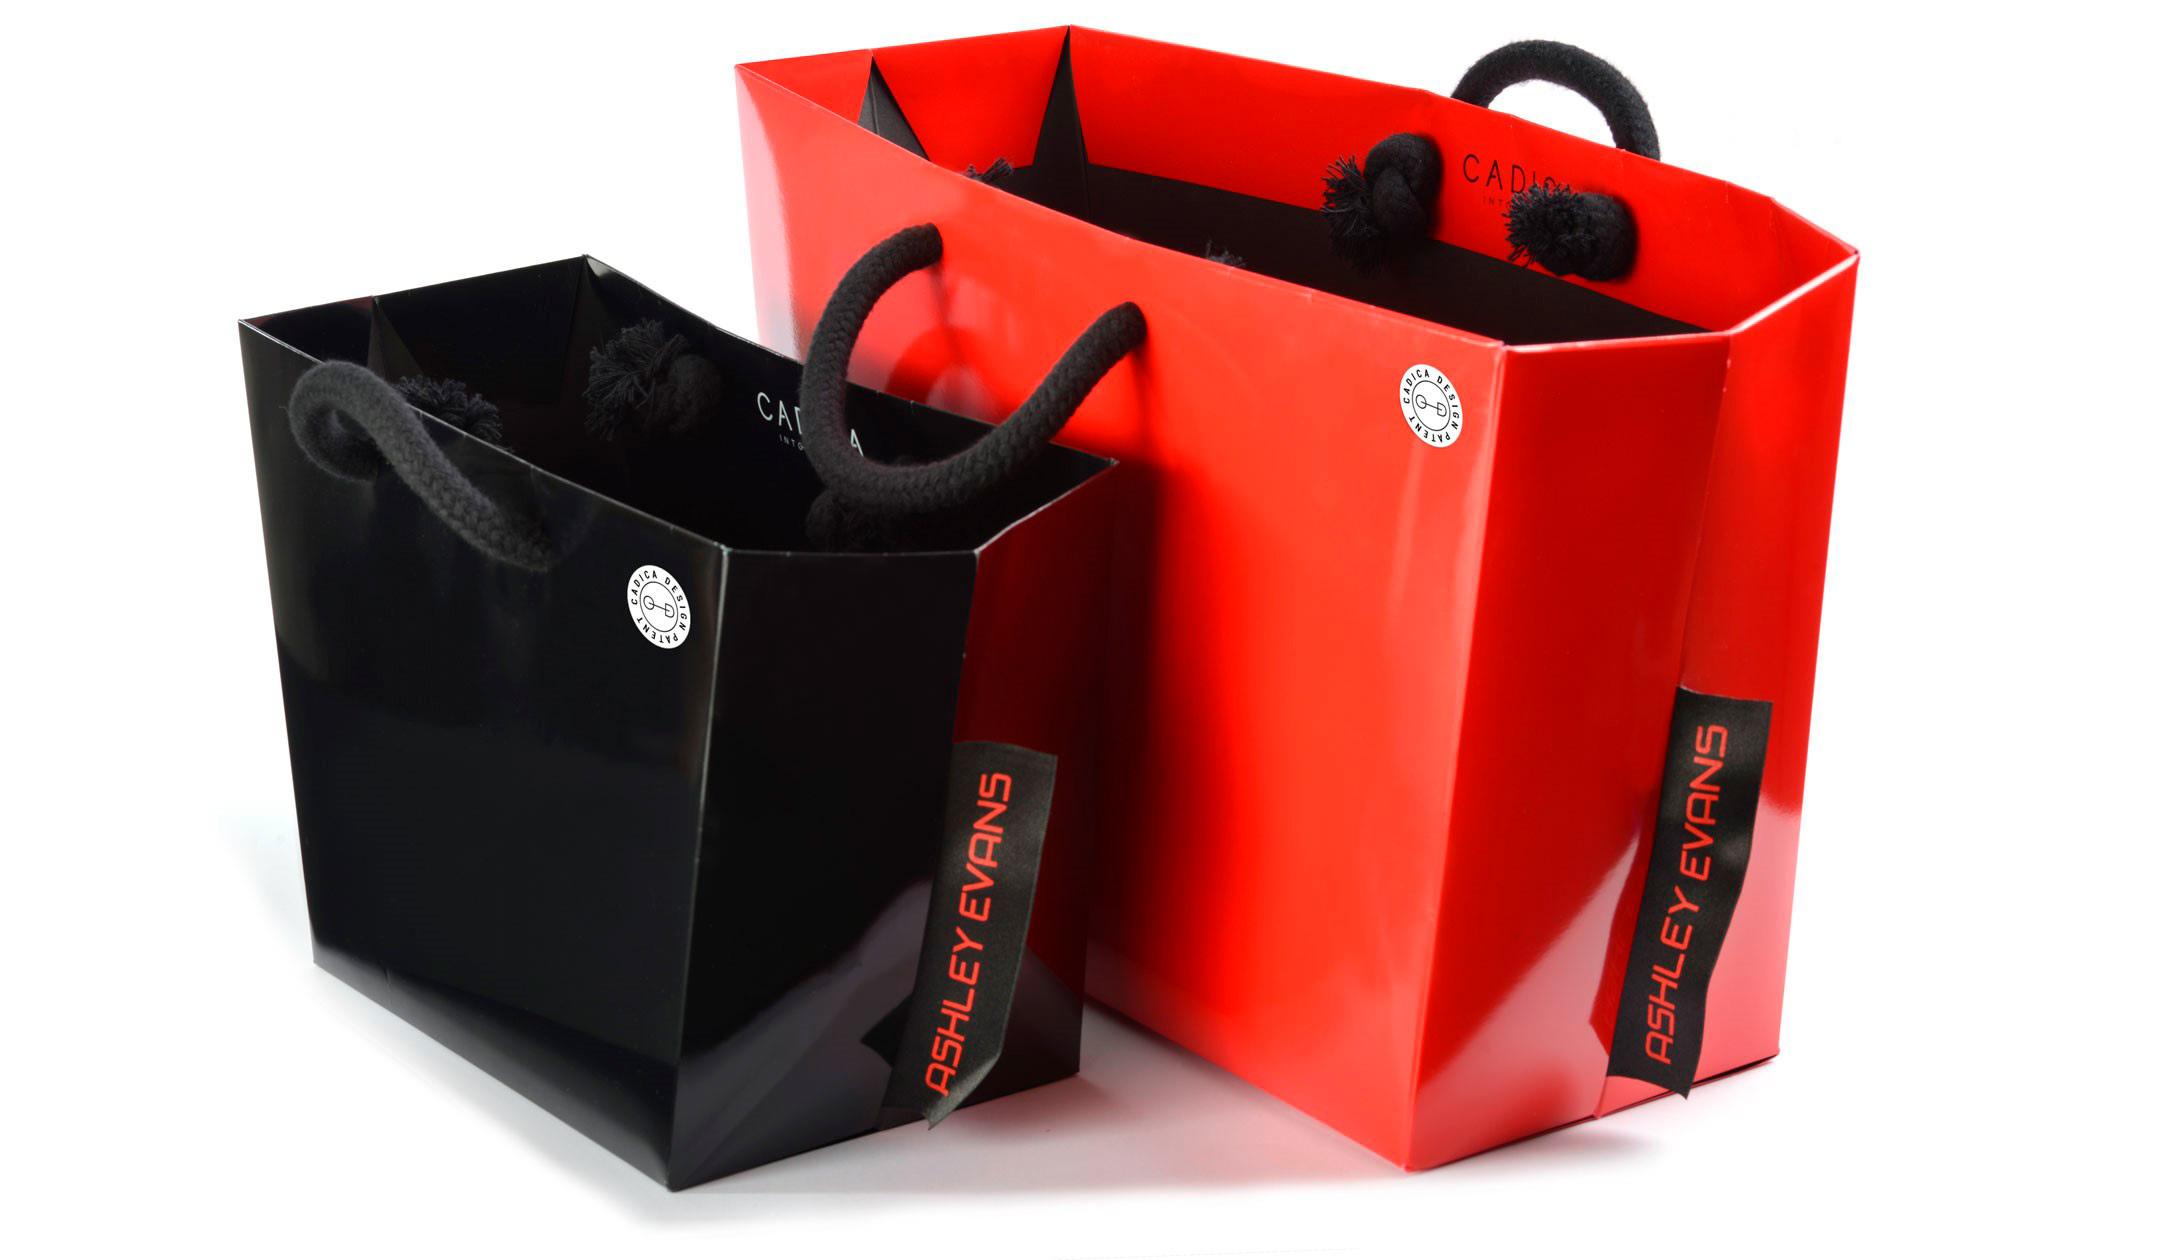 cadica_Packaging_ashley_evans